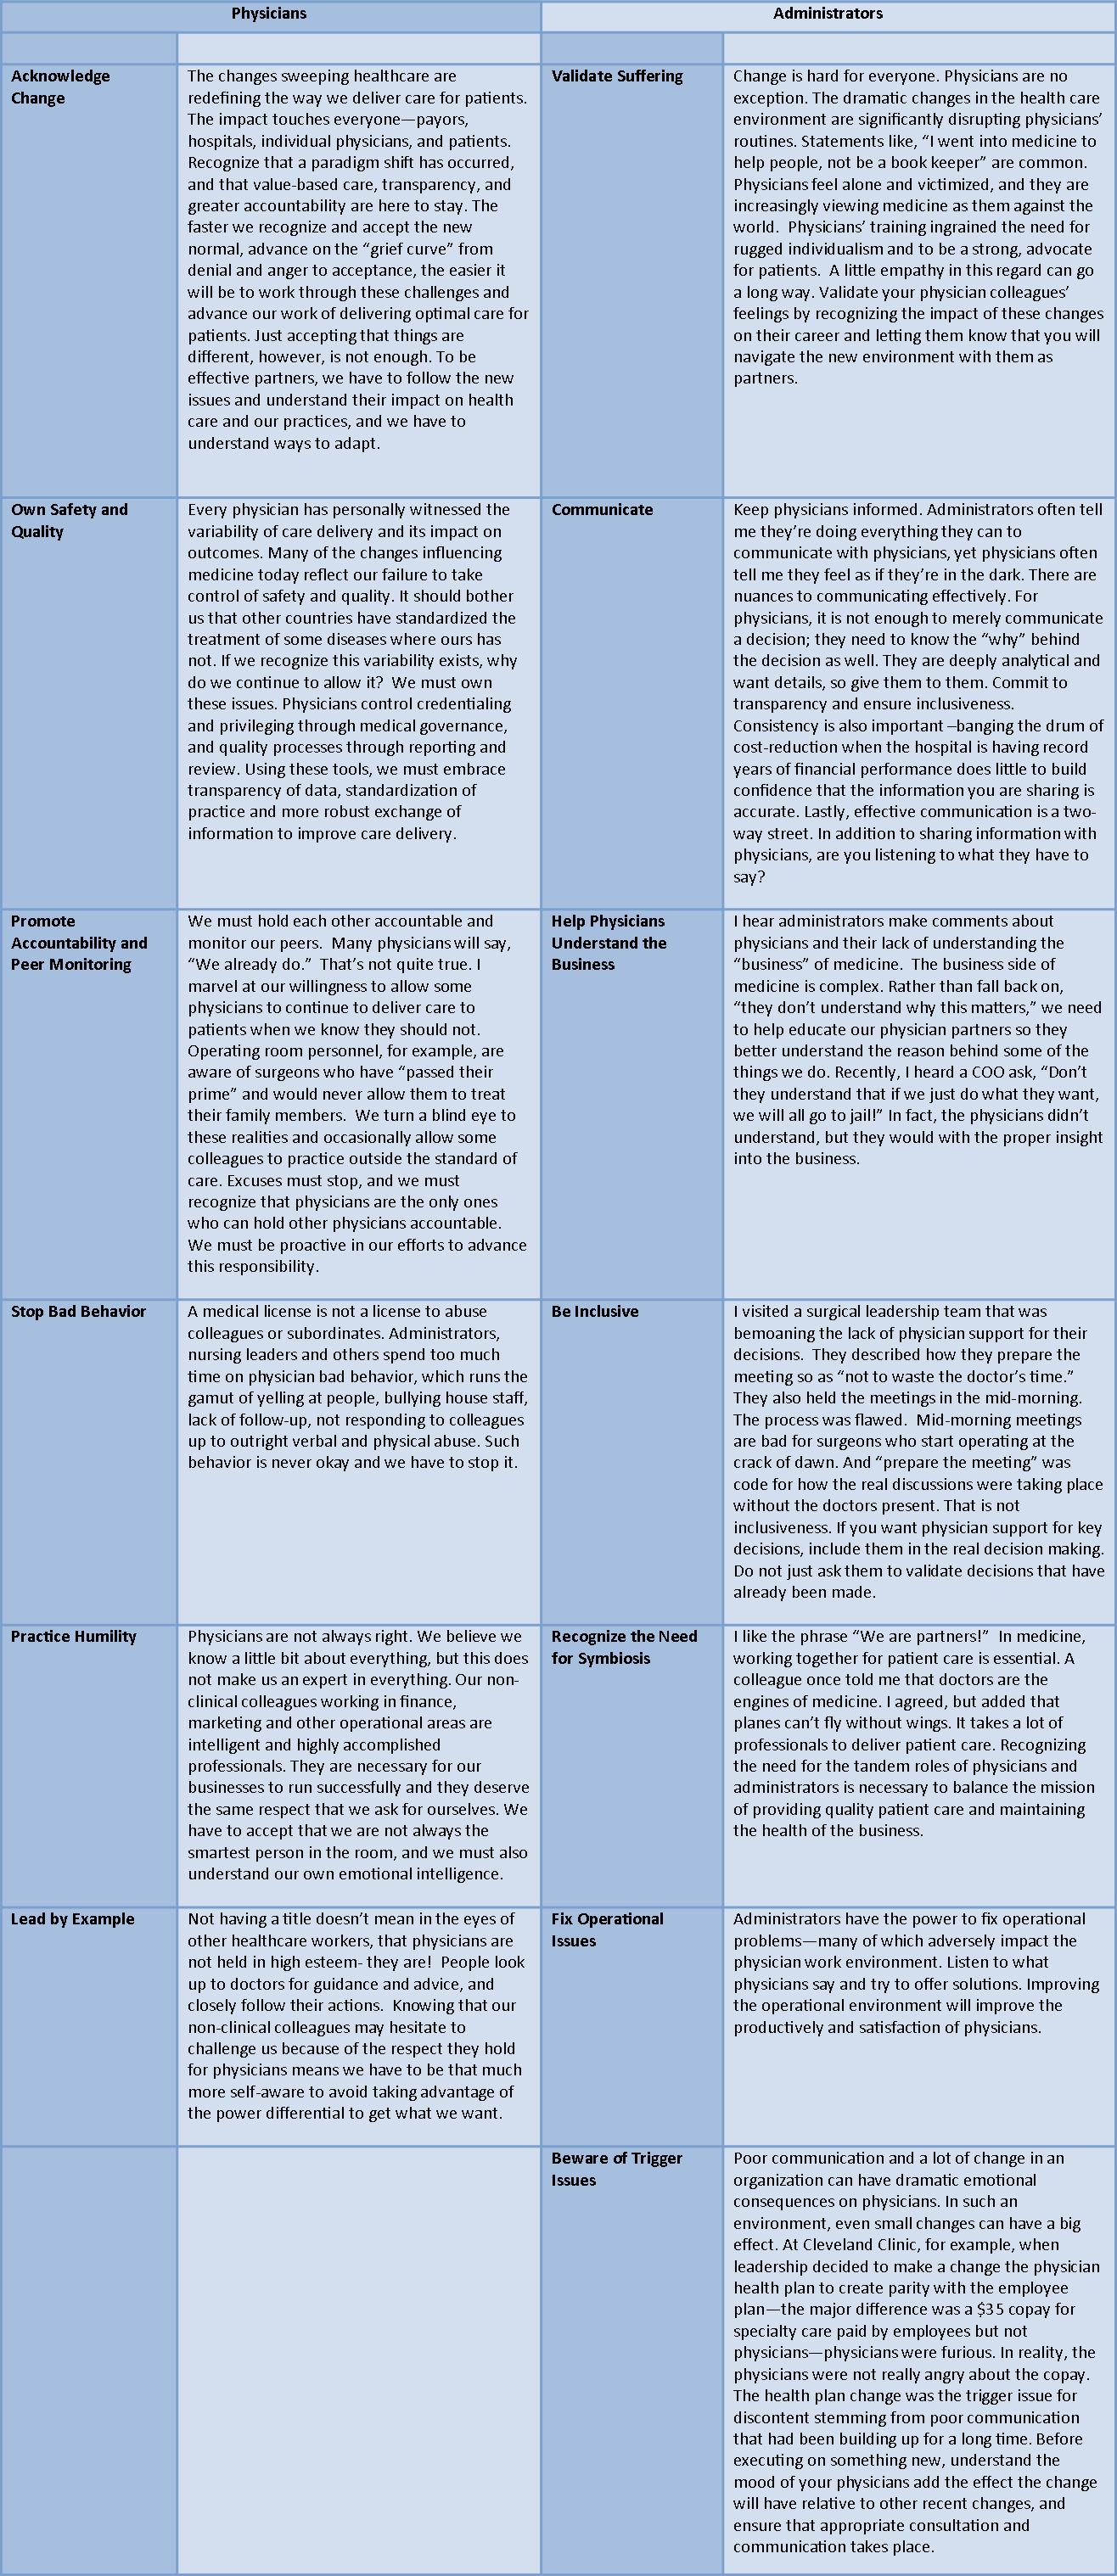 Physician Responsibility Matrix Table